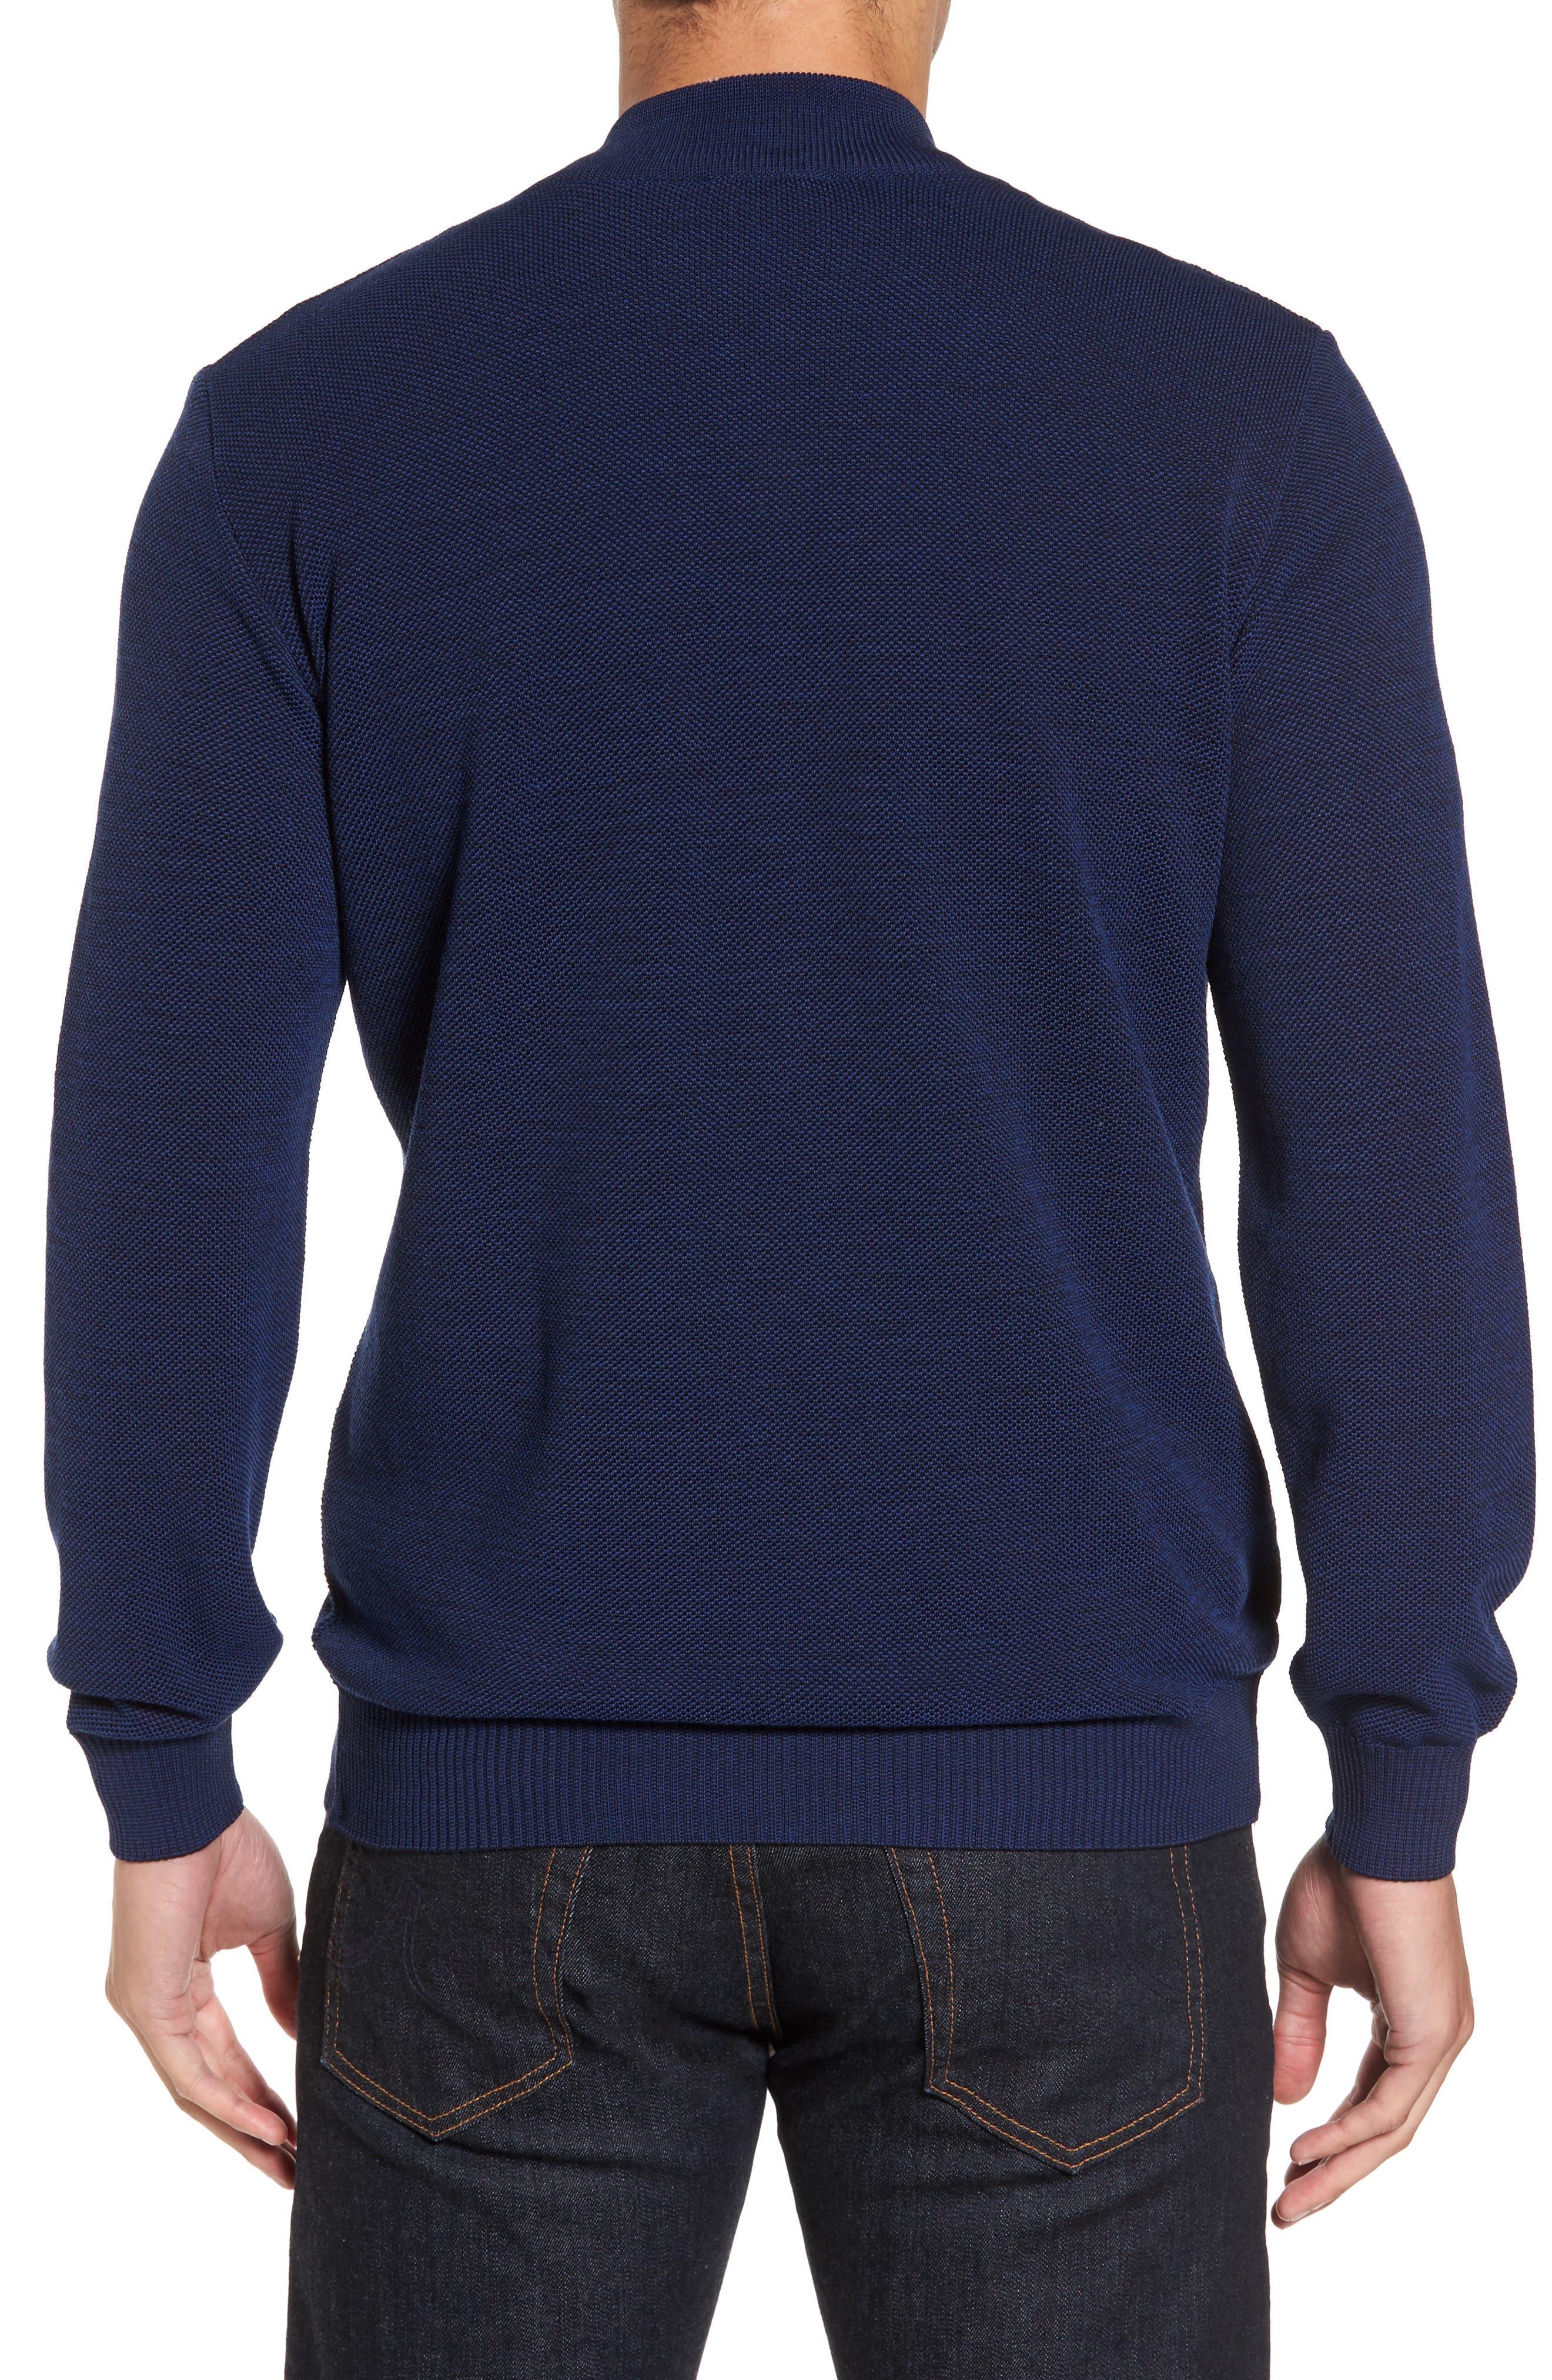 Paul&Shark Piqué Zip Wool Sweater,                             Alternate thumbnail 2, color,                             400